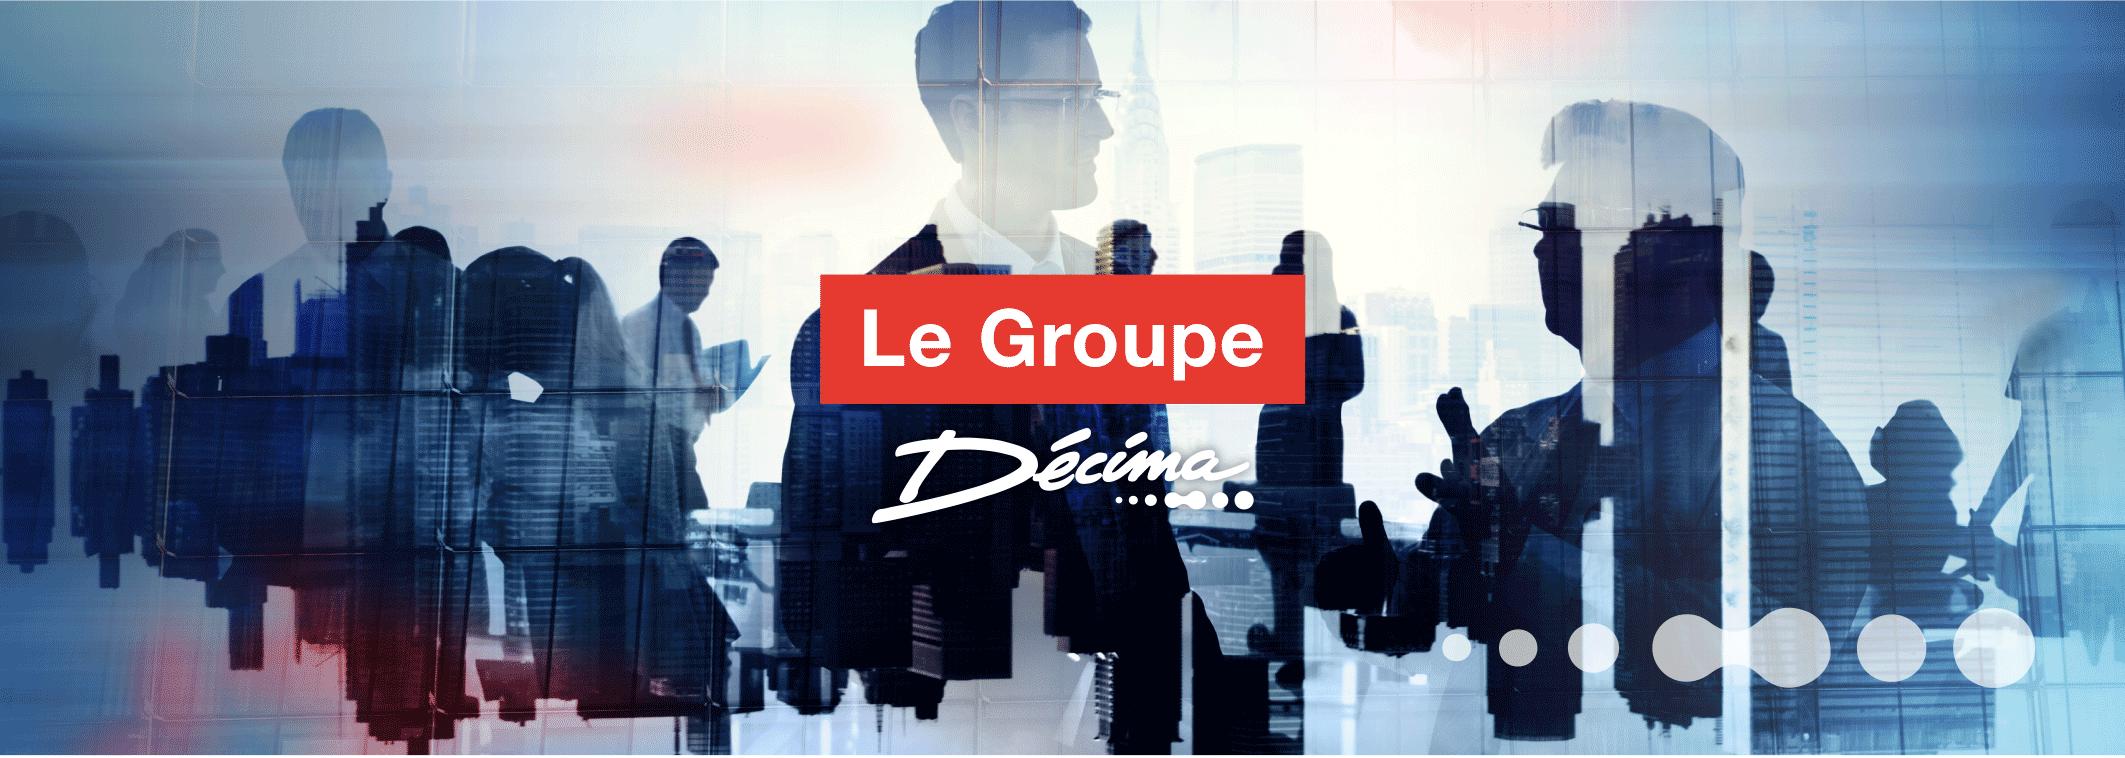 le_groupe